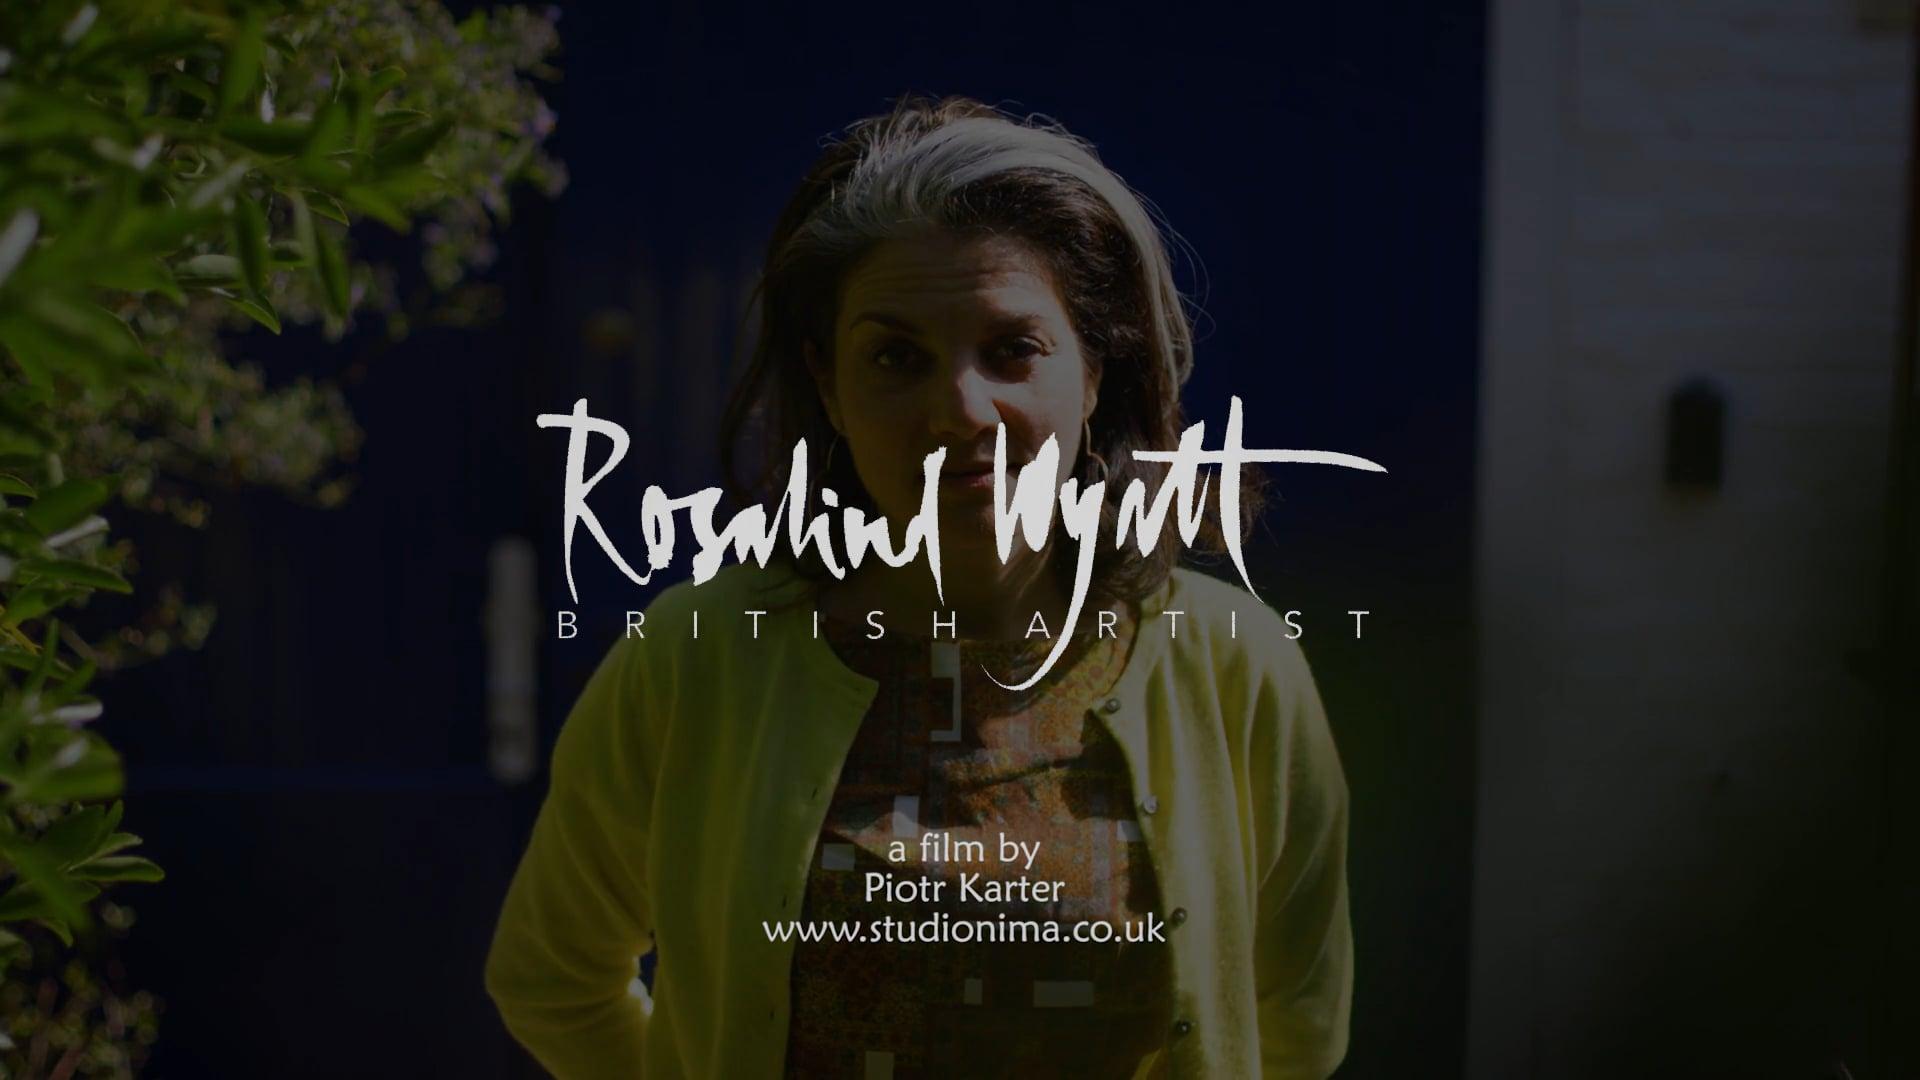 Rosalind Wyatt ABOUT VIDEO.mp4